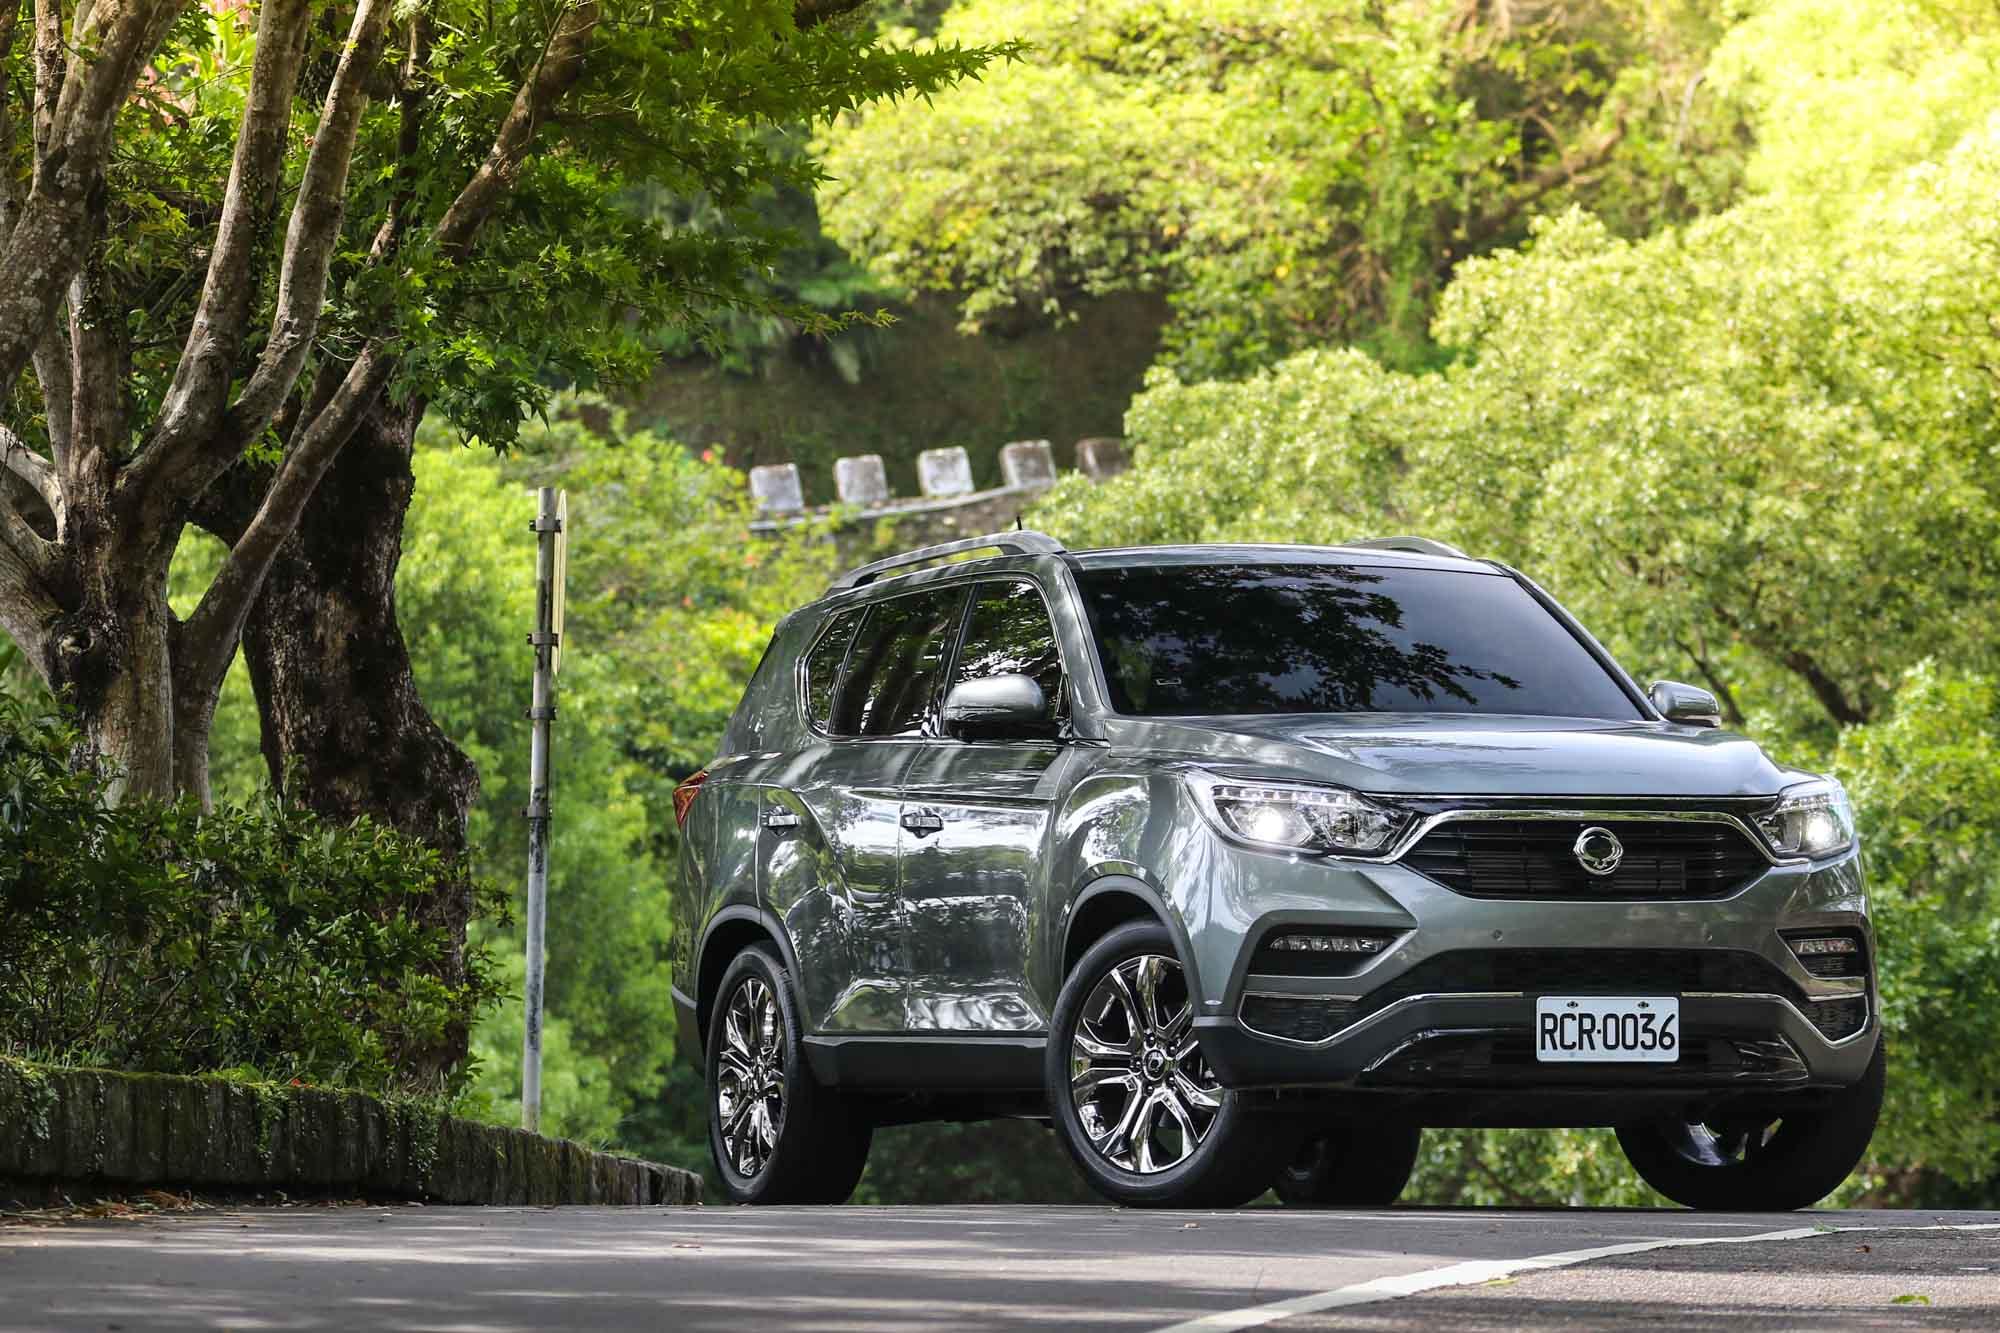 SsangYong Rexton 只有單一車型設定,售價為 186.8 萬元。